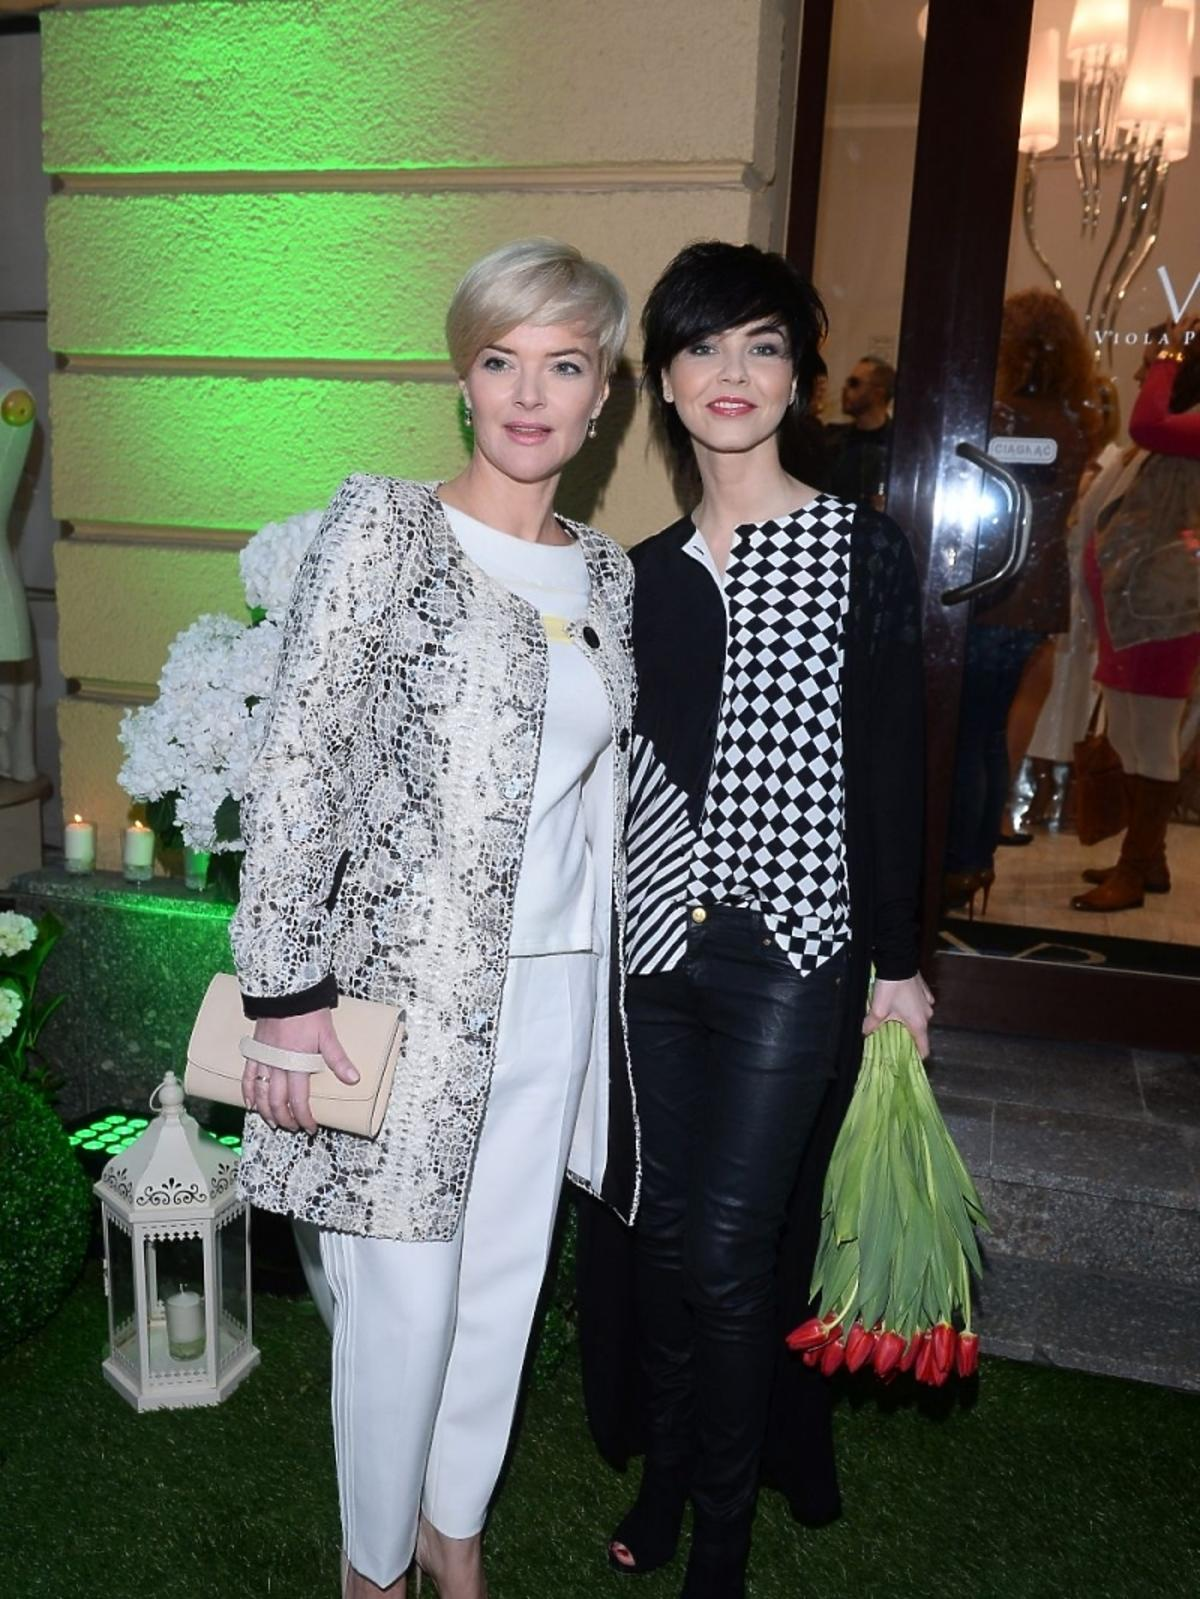 Monika Zamachowska i Paulina Drażba na otwarciu butiku Violi Piekut